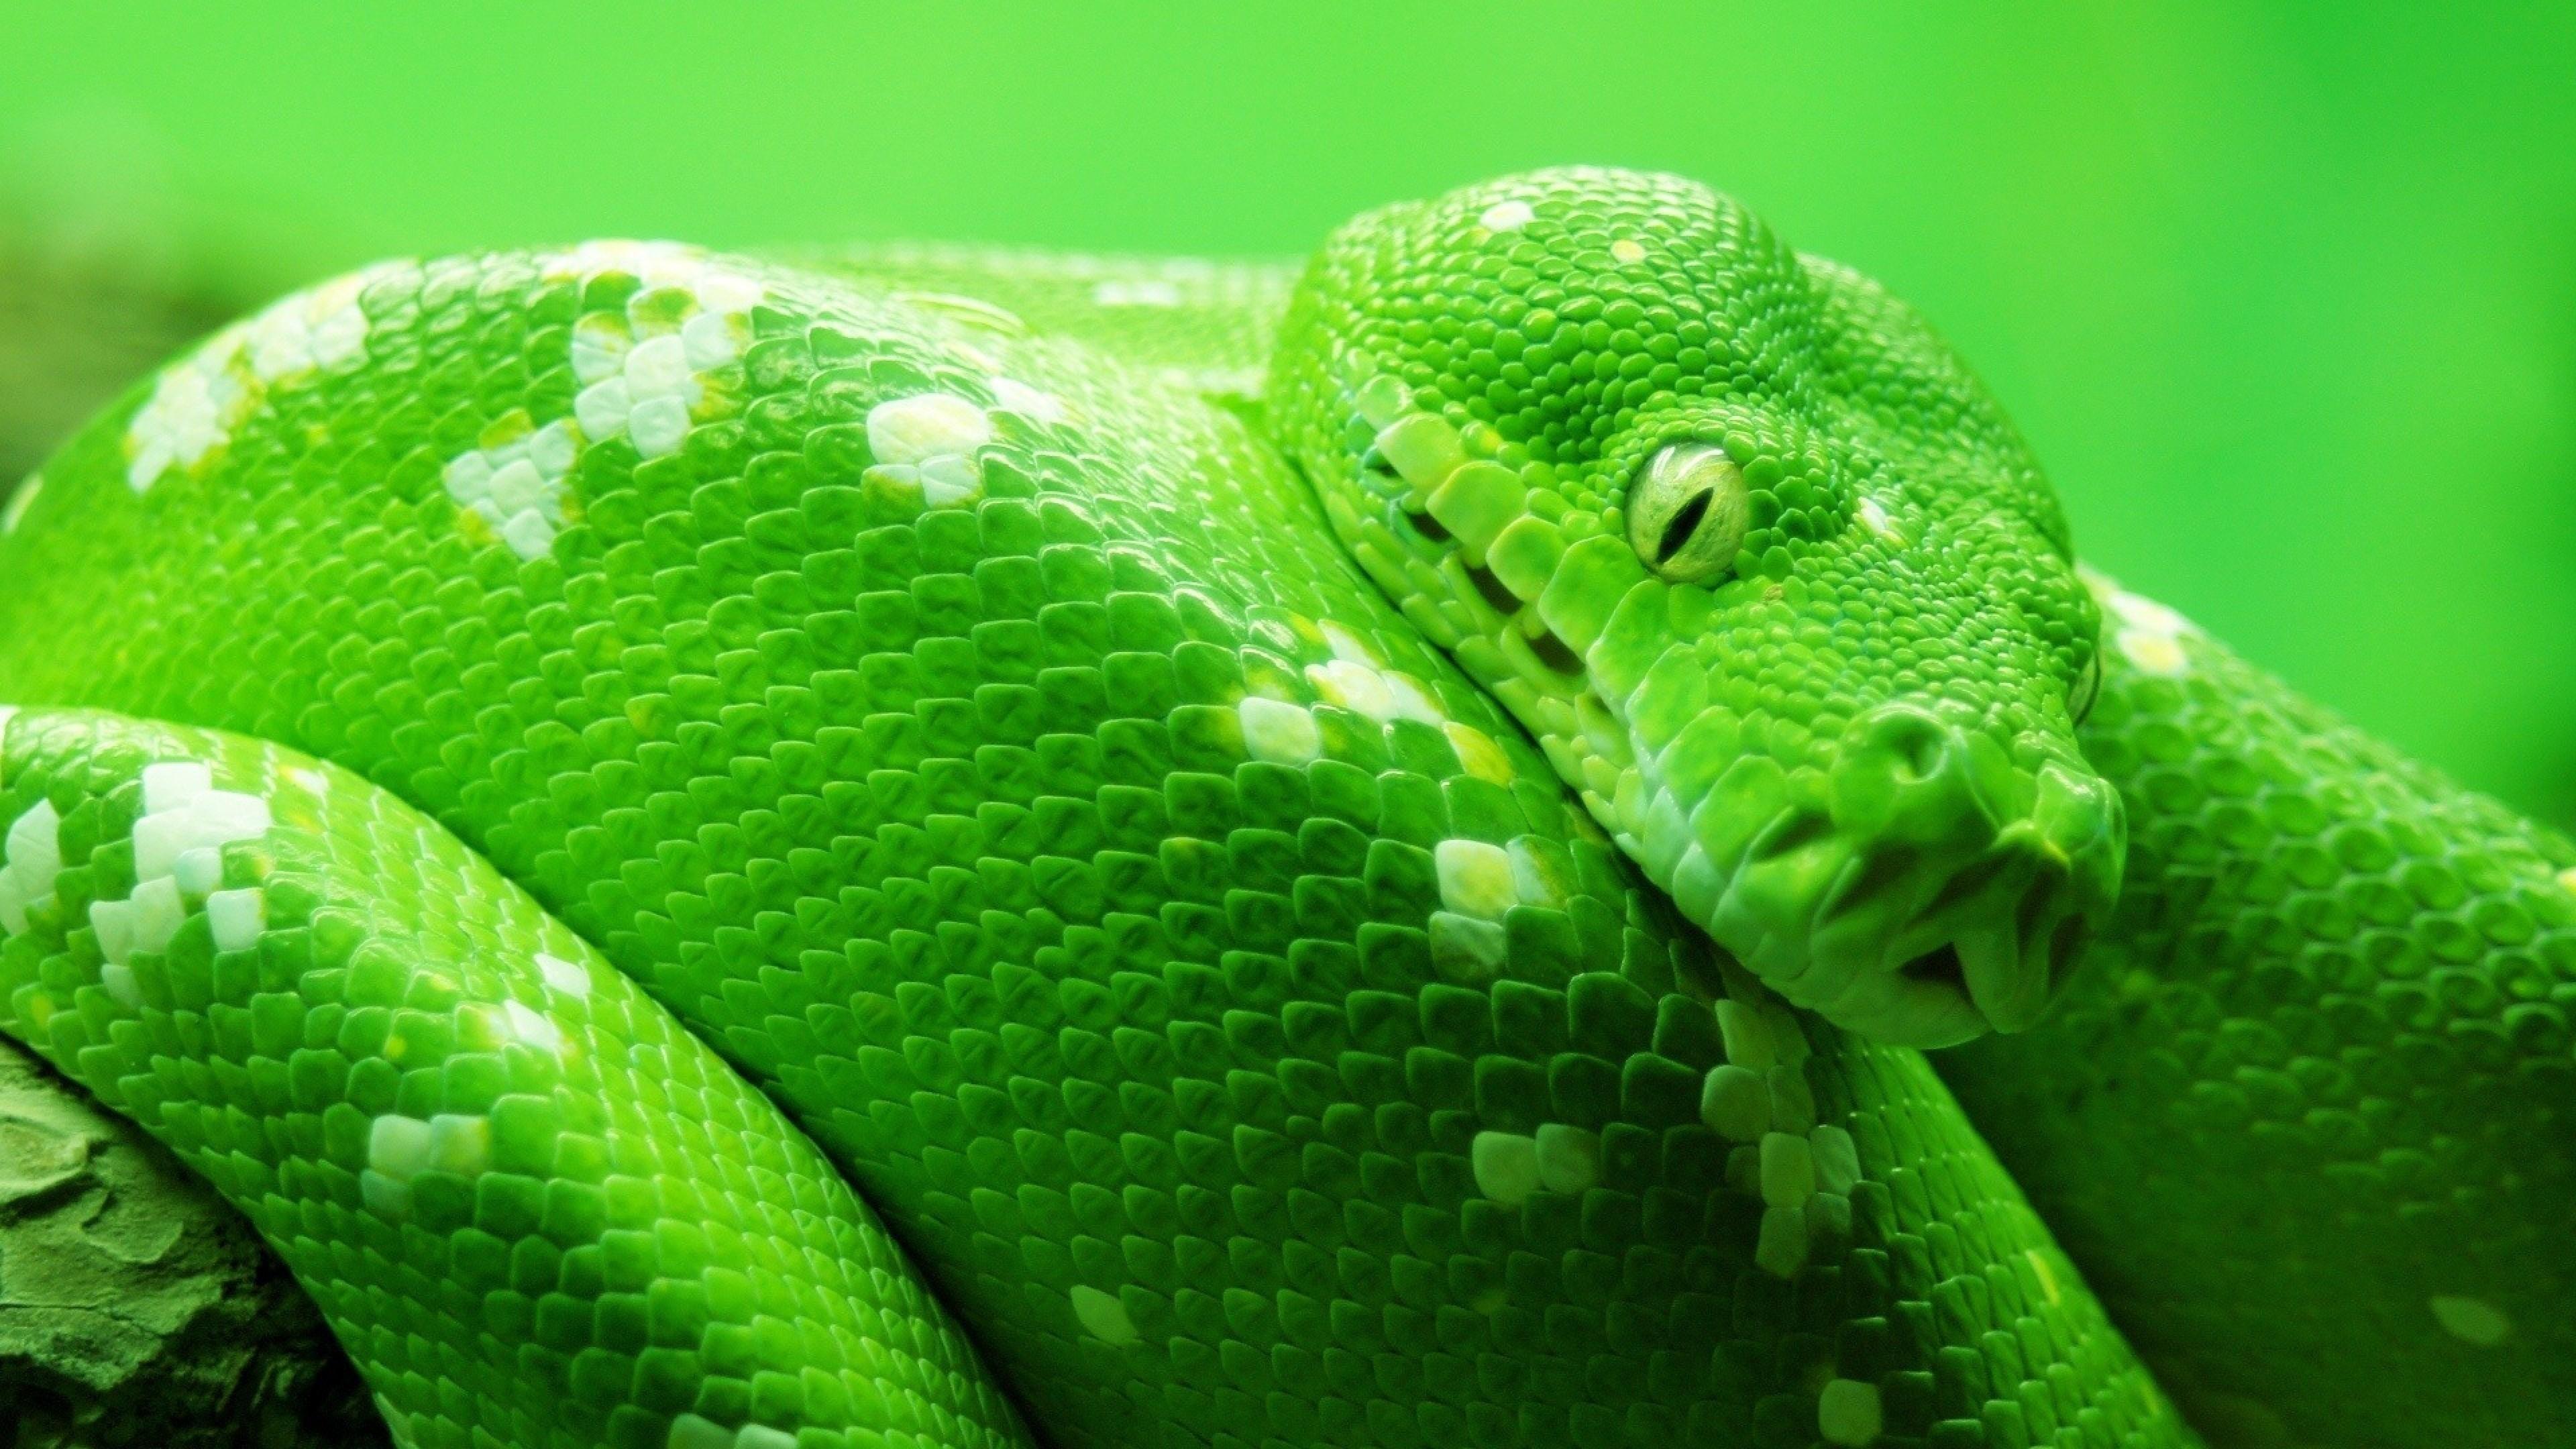 Wallpaper snake green 4k animals 14978 - Green snake hd wallpaper ...